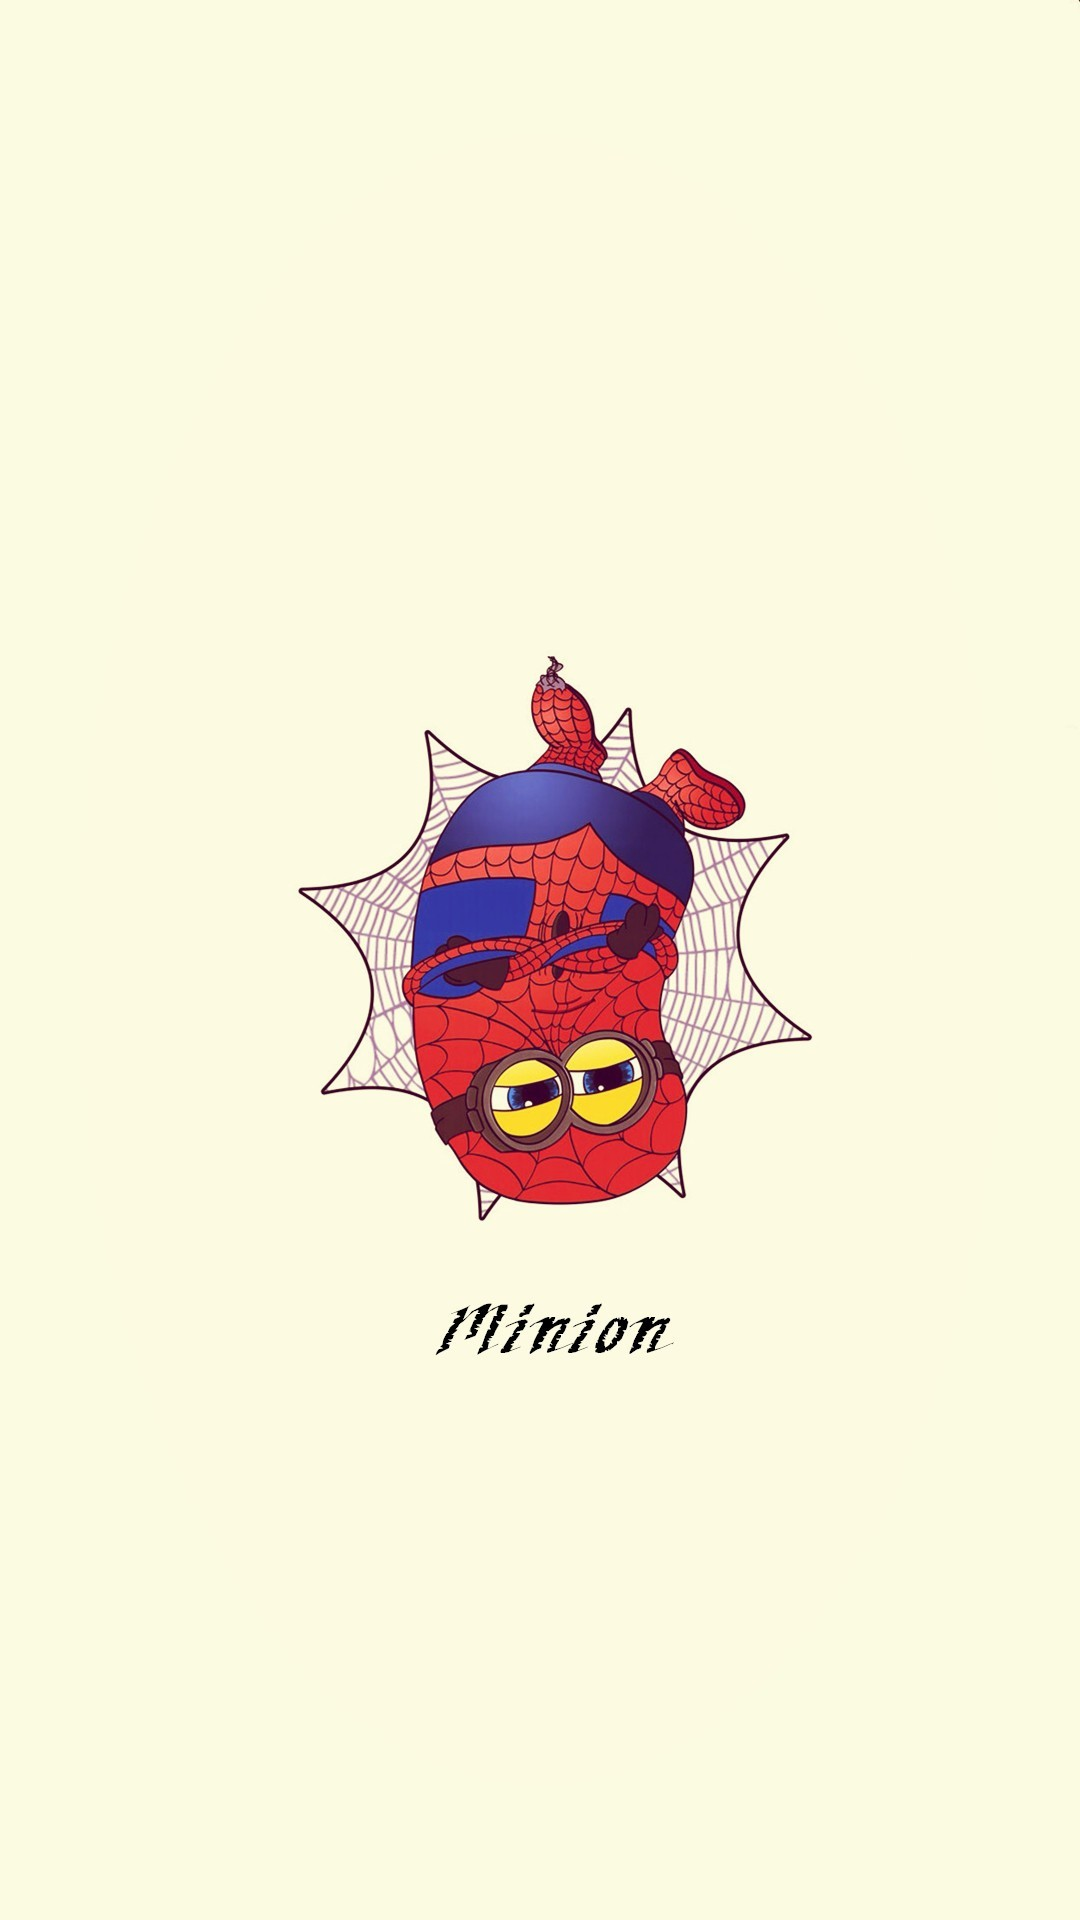 2014 Halloween spider man minion apple iphone 6 plus wallpaper HD – cartoon  Despicable Me iphone